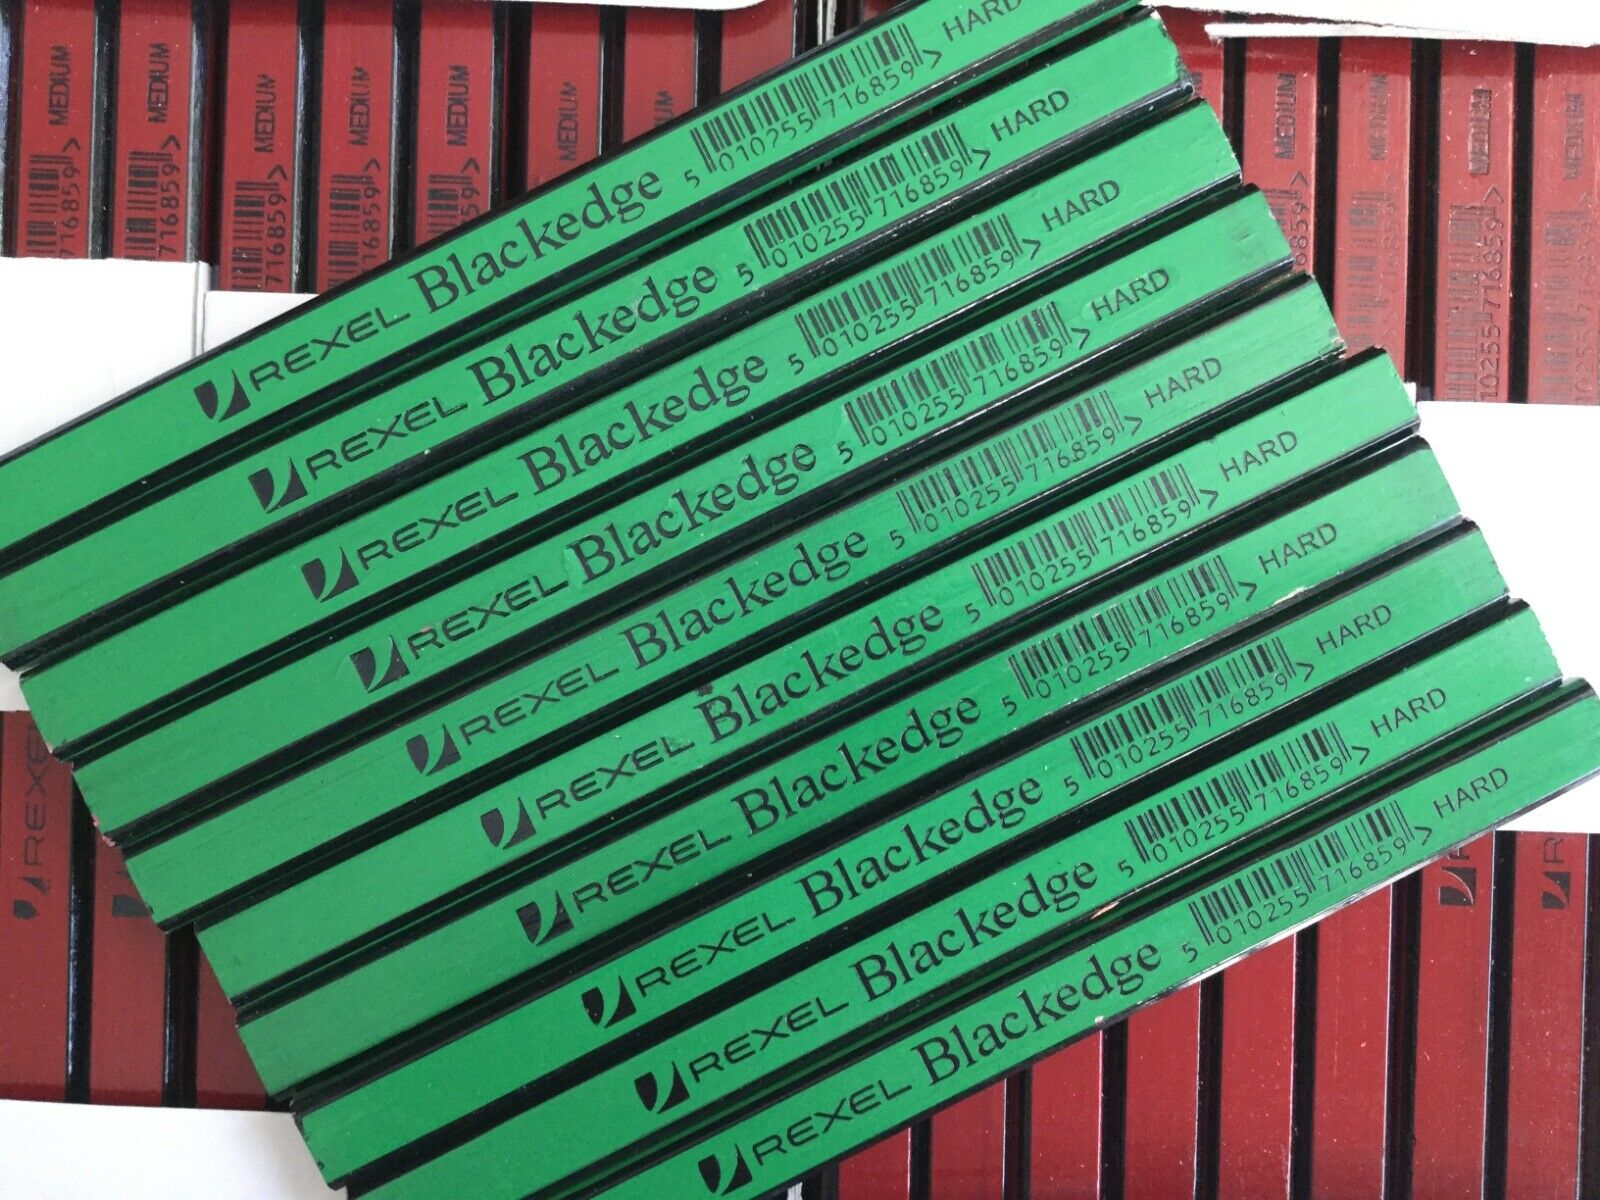 10 X CARPENTERS PENCILS BLACKEDGE REXEL H HARD GREEN wood brick plaster